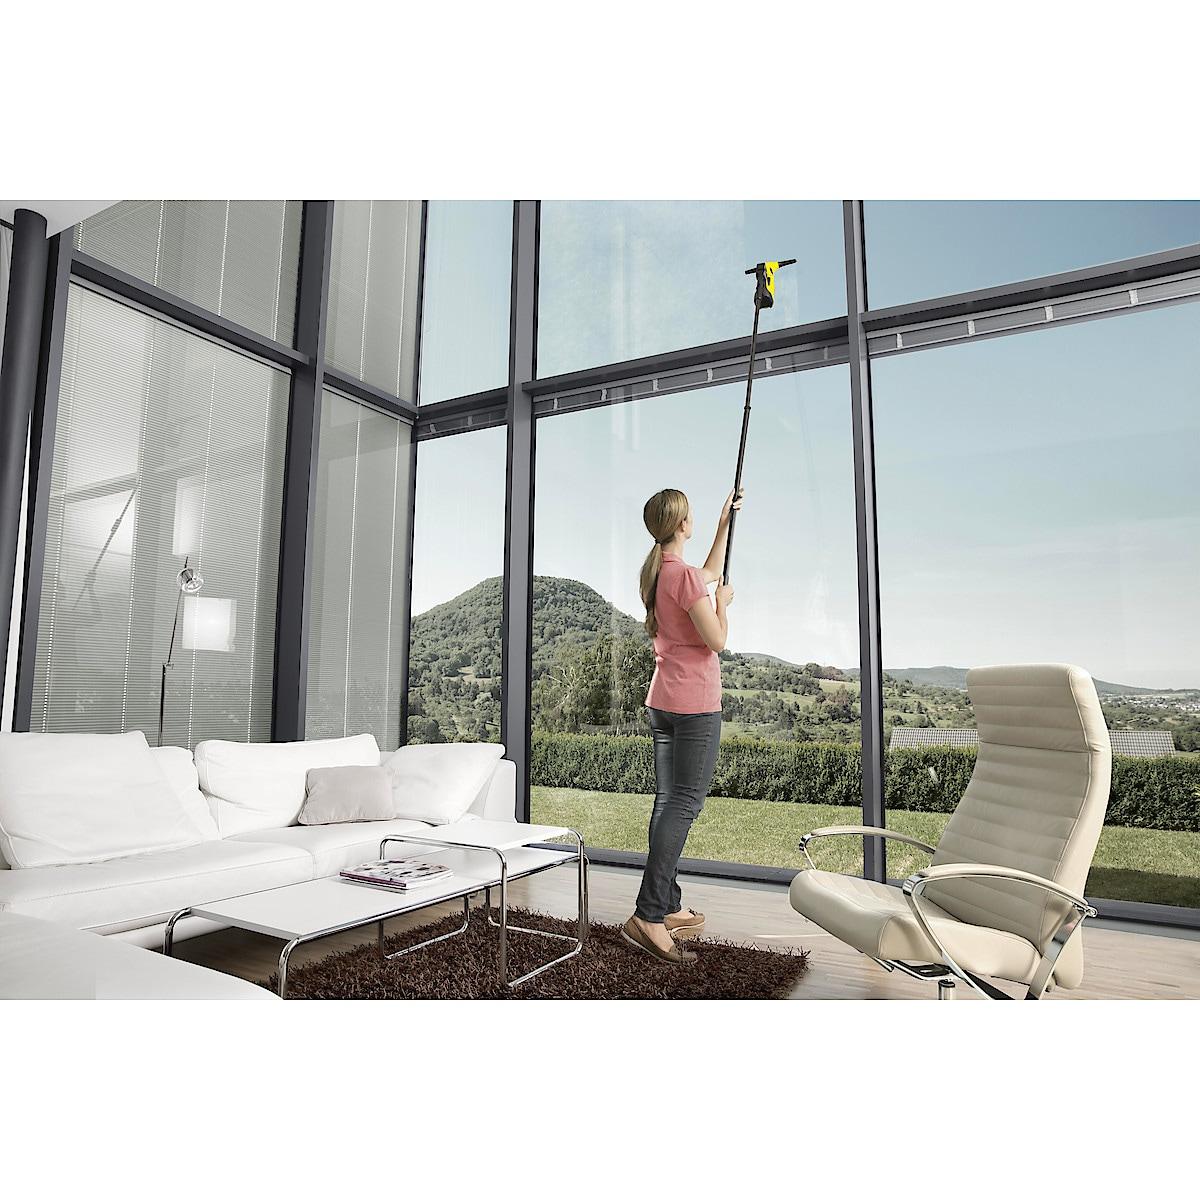 Kärcher WV 2 Premium vindusvasker